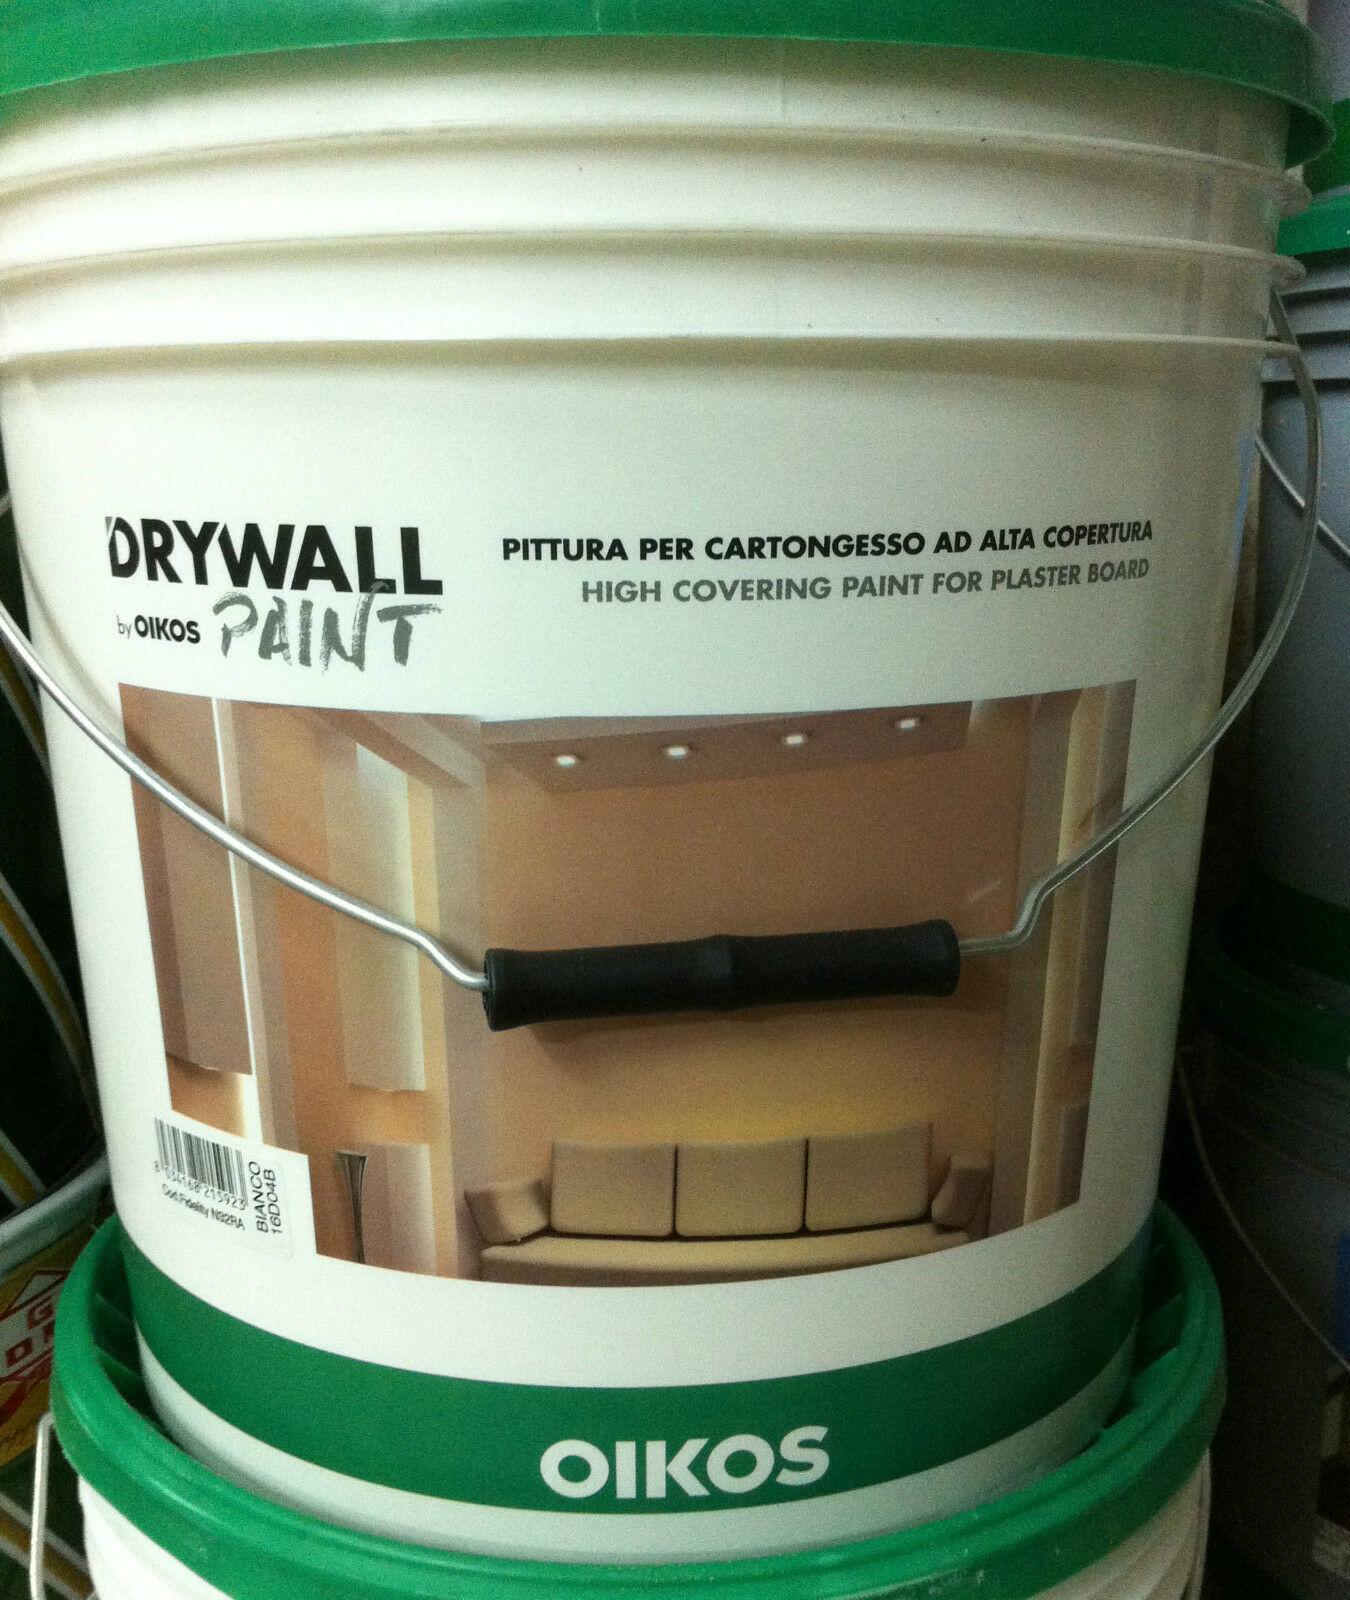 Oikos drywall paint pittura per cartongesso ad alta copertura bianca 14lt